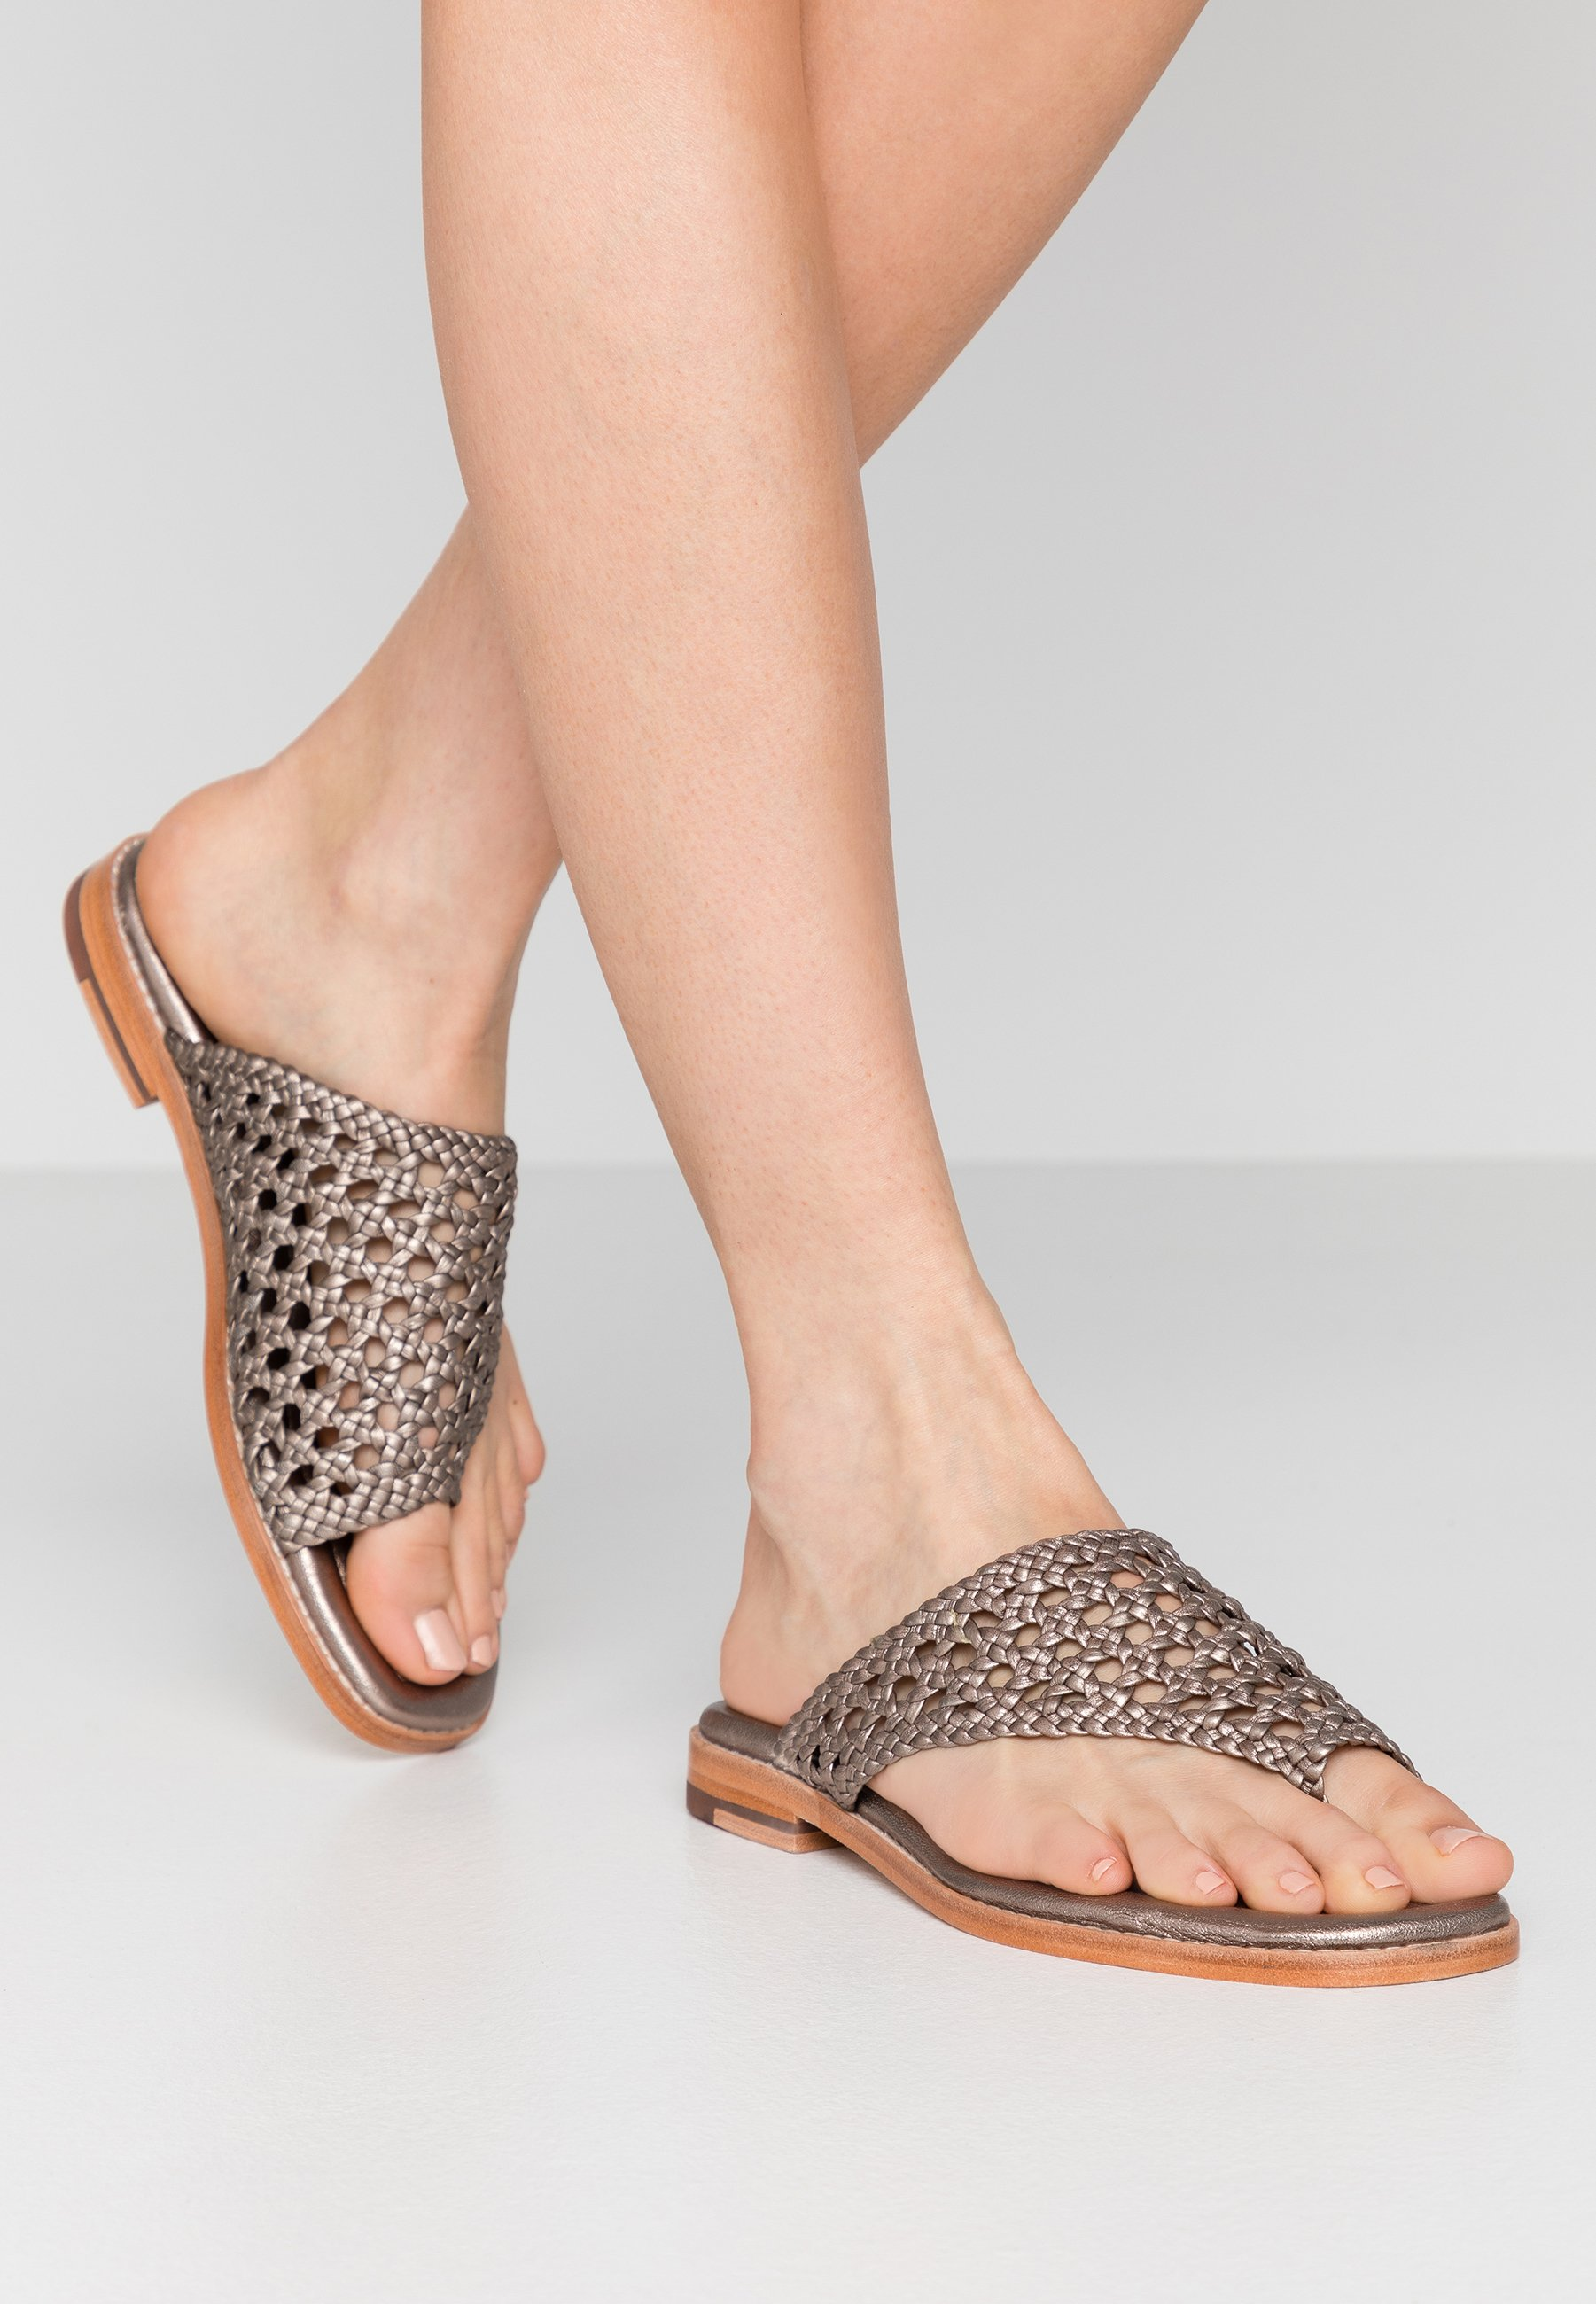 Melvin & Hamilton ELODIE - Pantolette flach - pewter   Damen Schuhe 2020